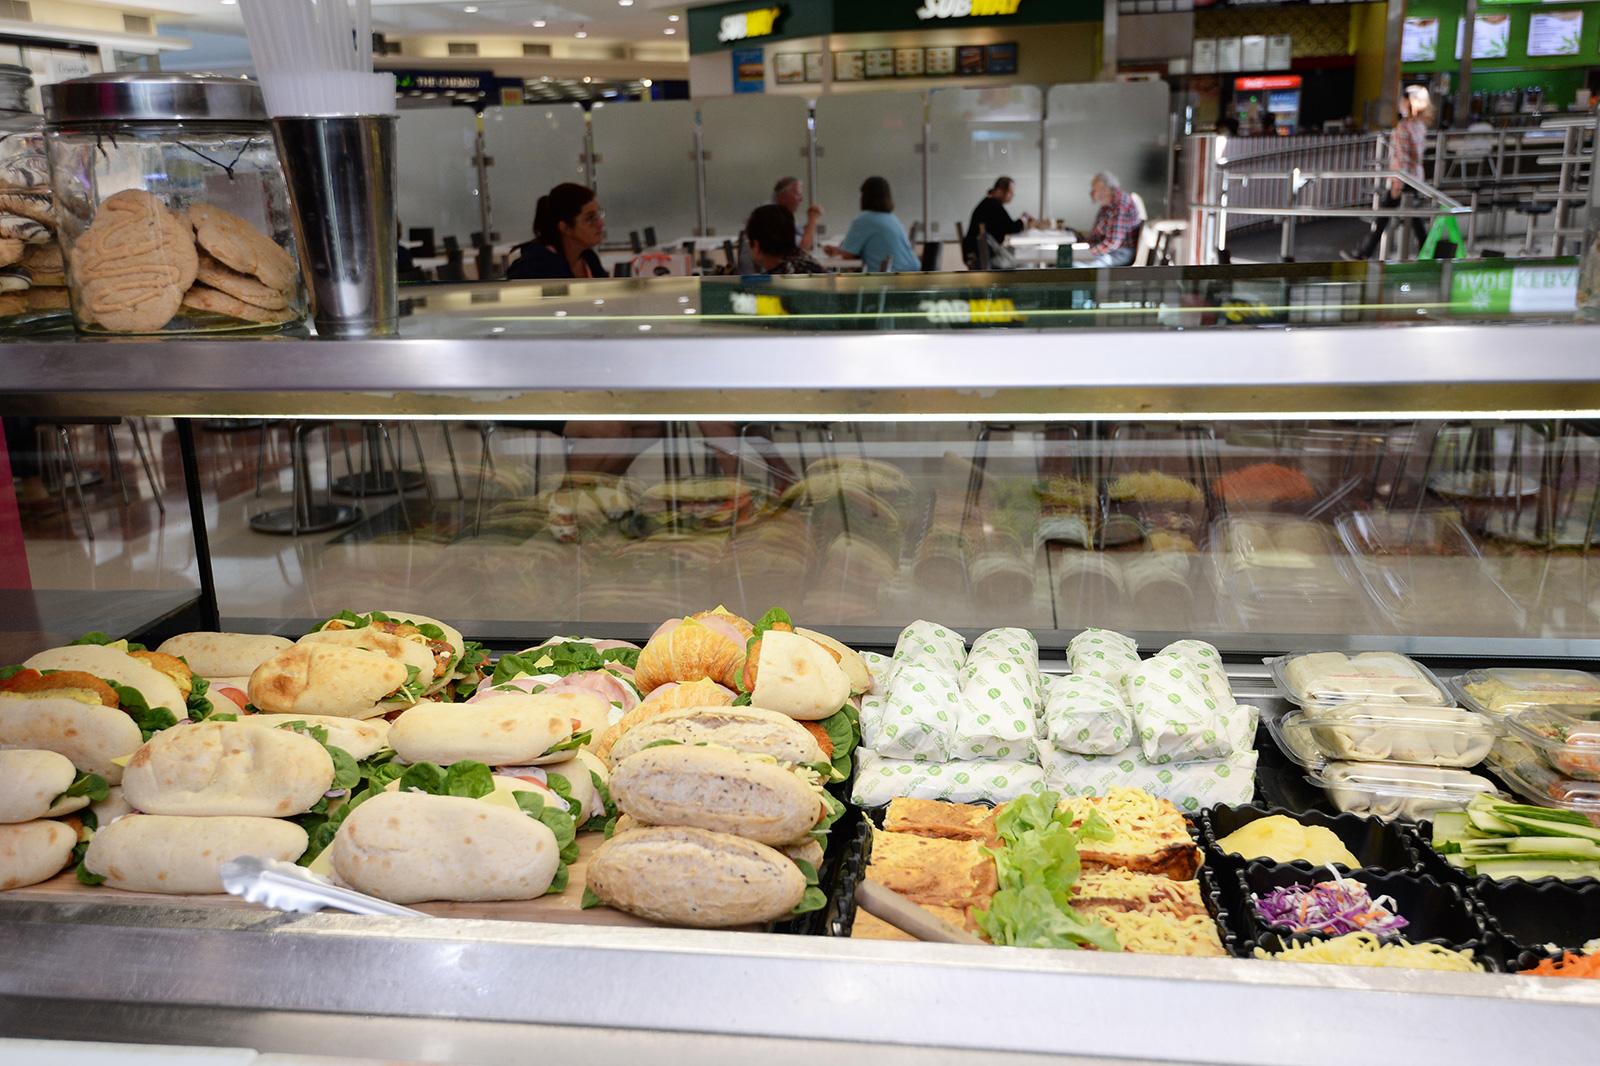 takeaway-sandwich-shop-healthy-habits-grafton-shopping-world-reduced-price-5